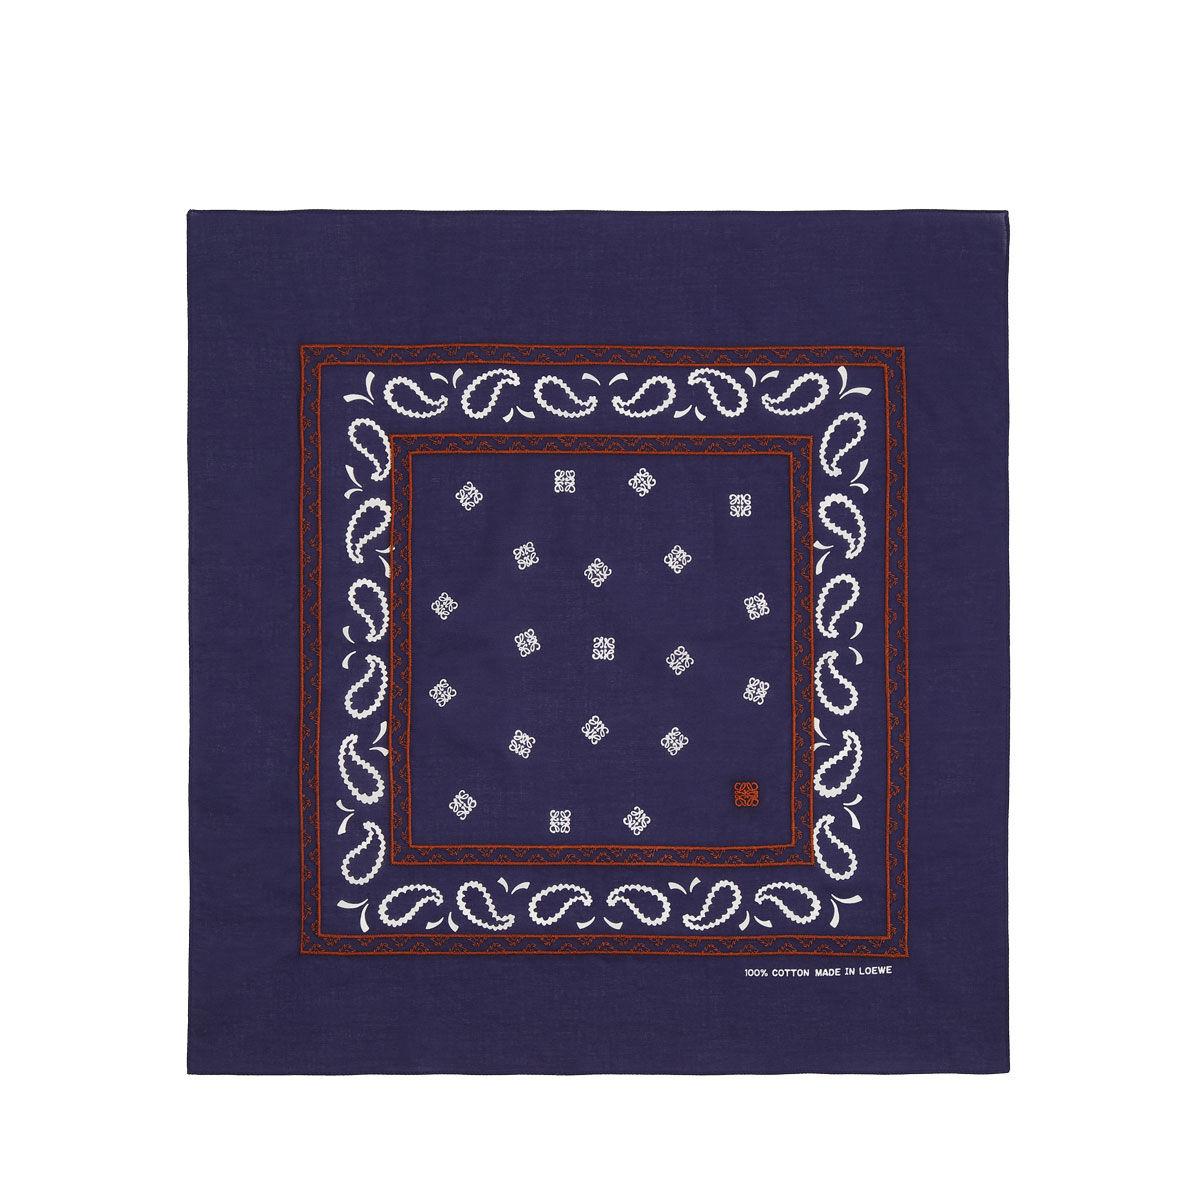 LOEWE 50X50 Bandana Embroideries Marino Oscuro all